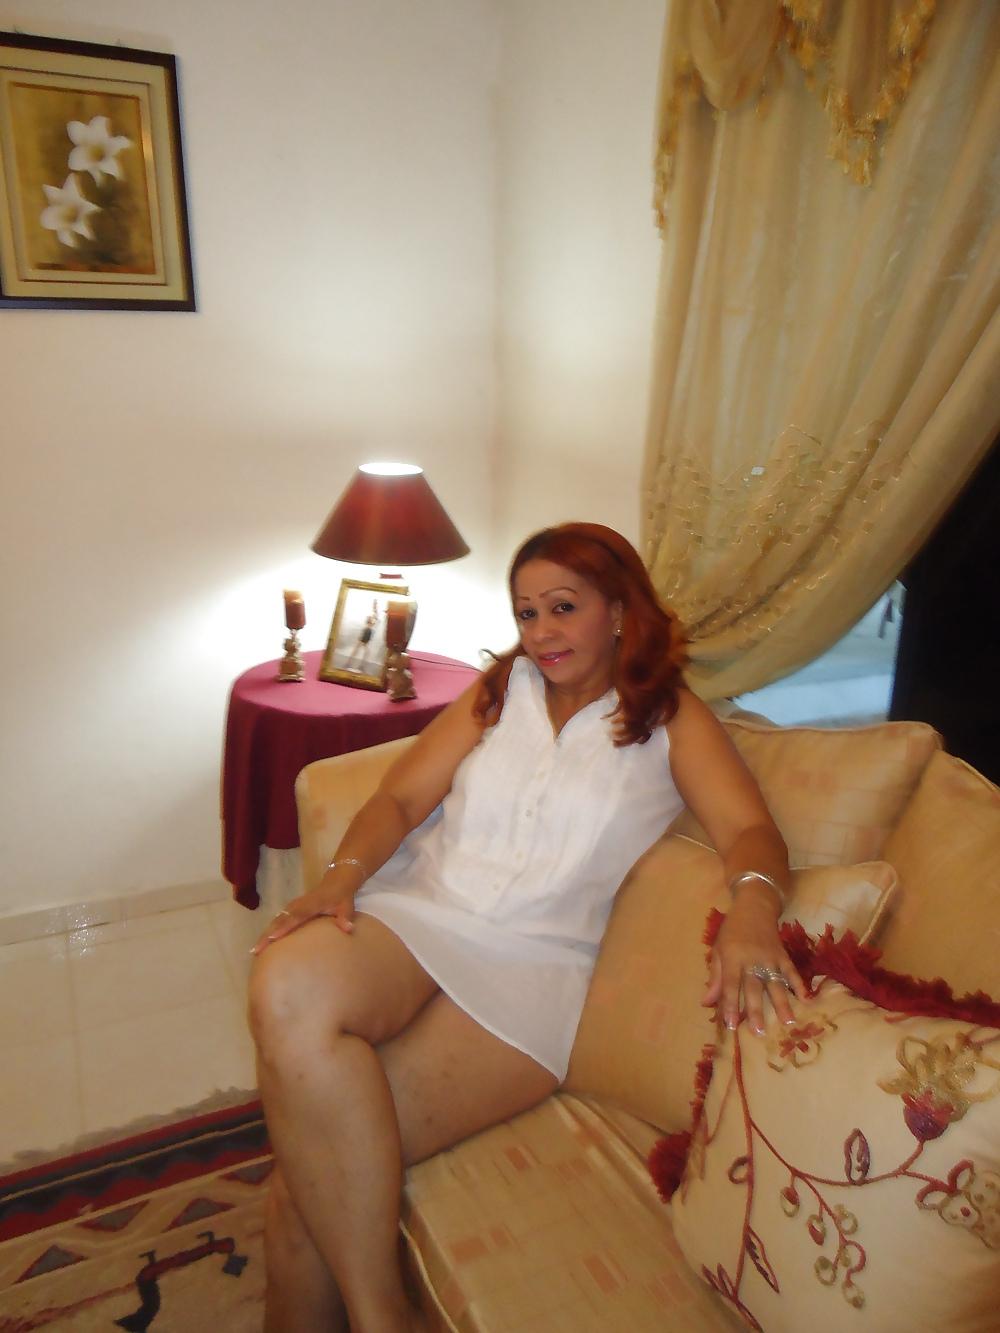 Nude mature curvey amature pics, chubby blonde irish teen naked